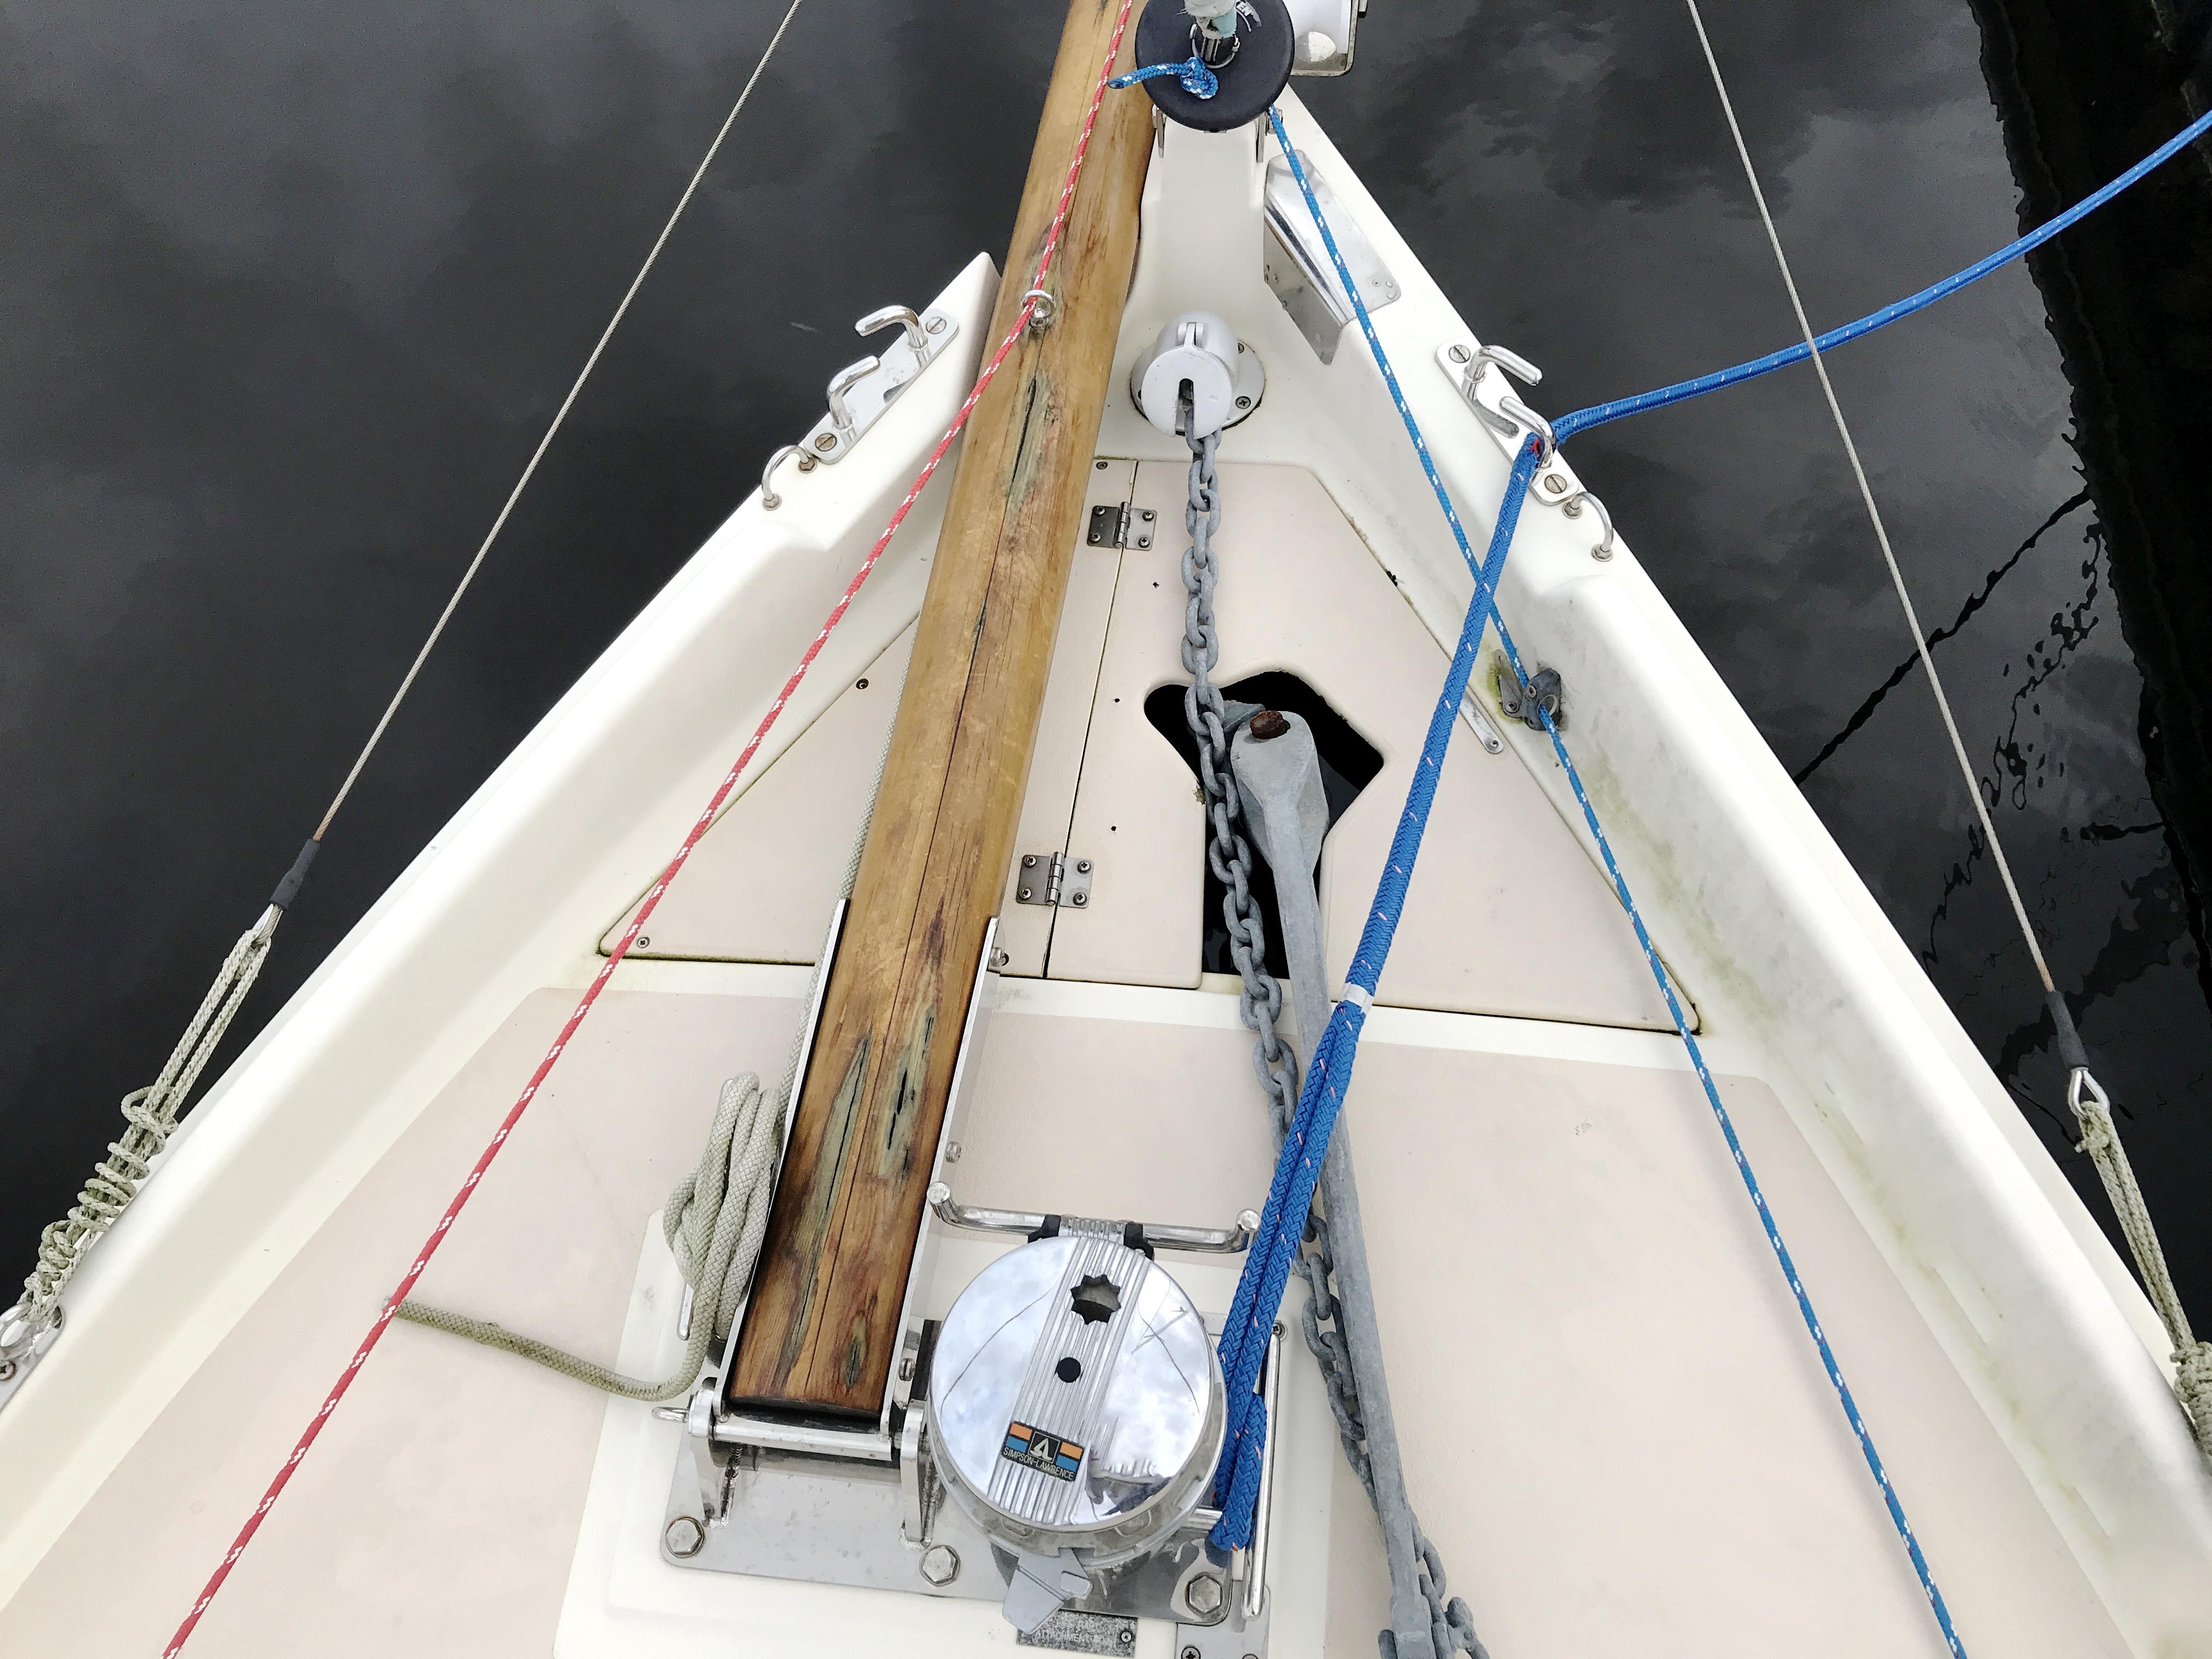 Cornish Crabbers Crabber 22 - bow sprit, windlass, anchor locker